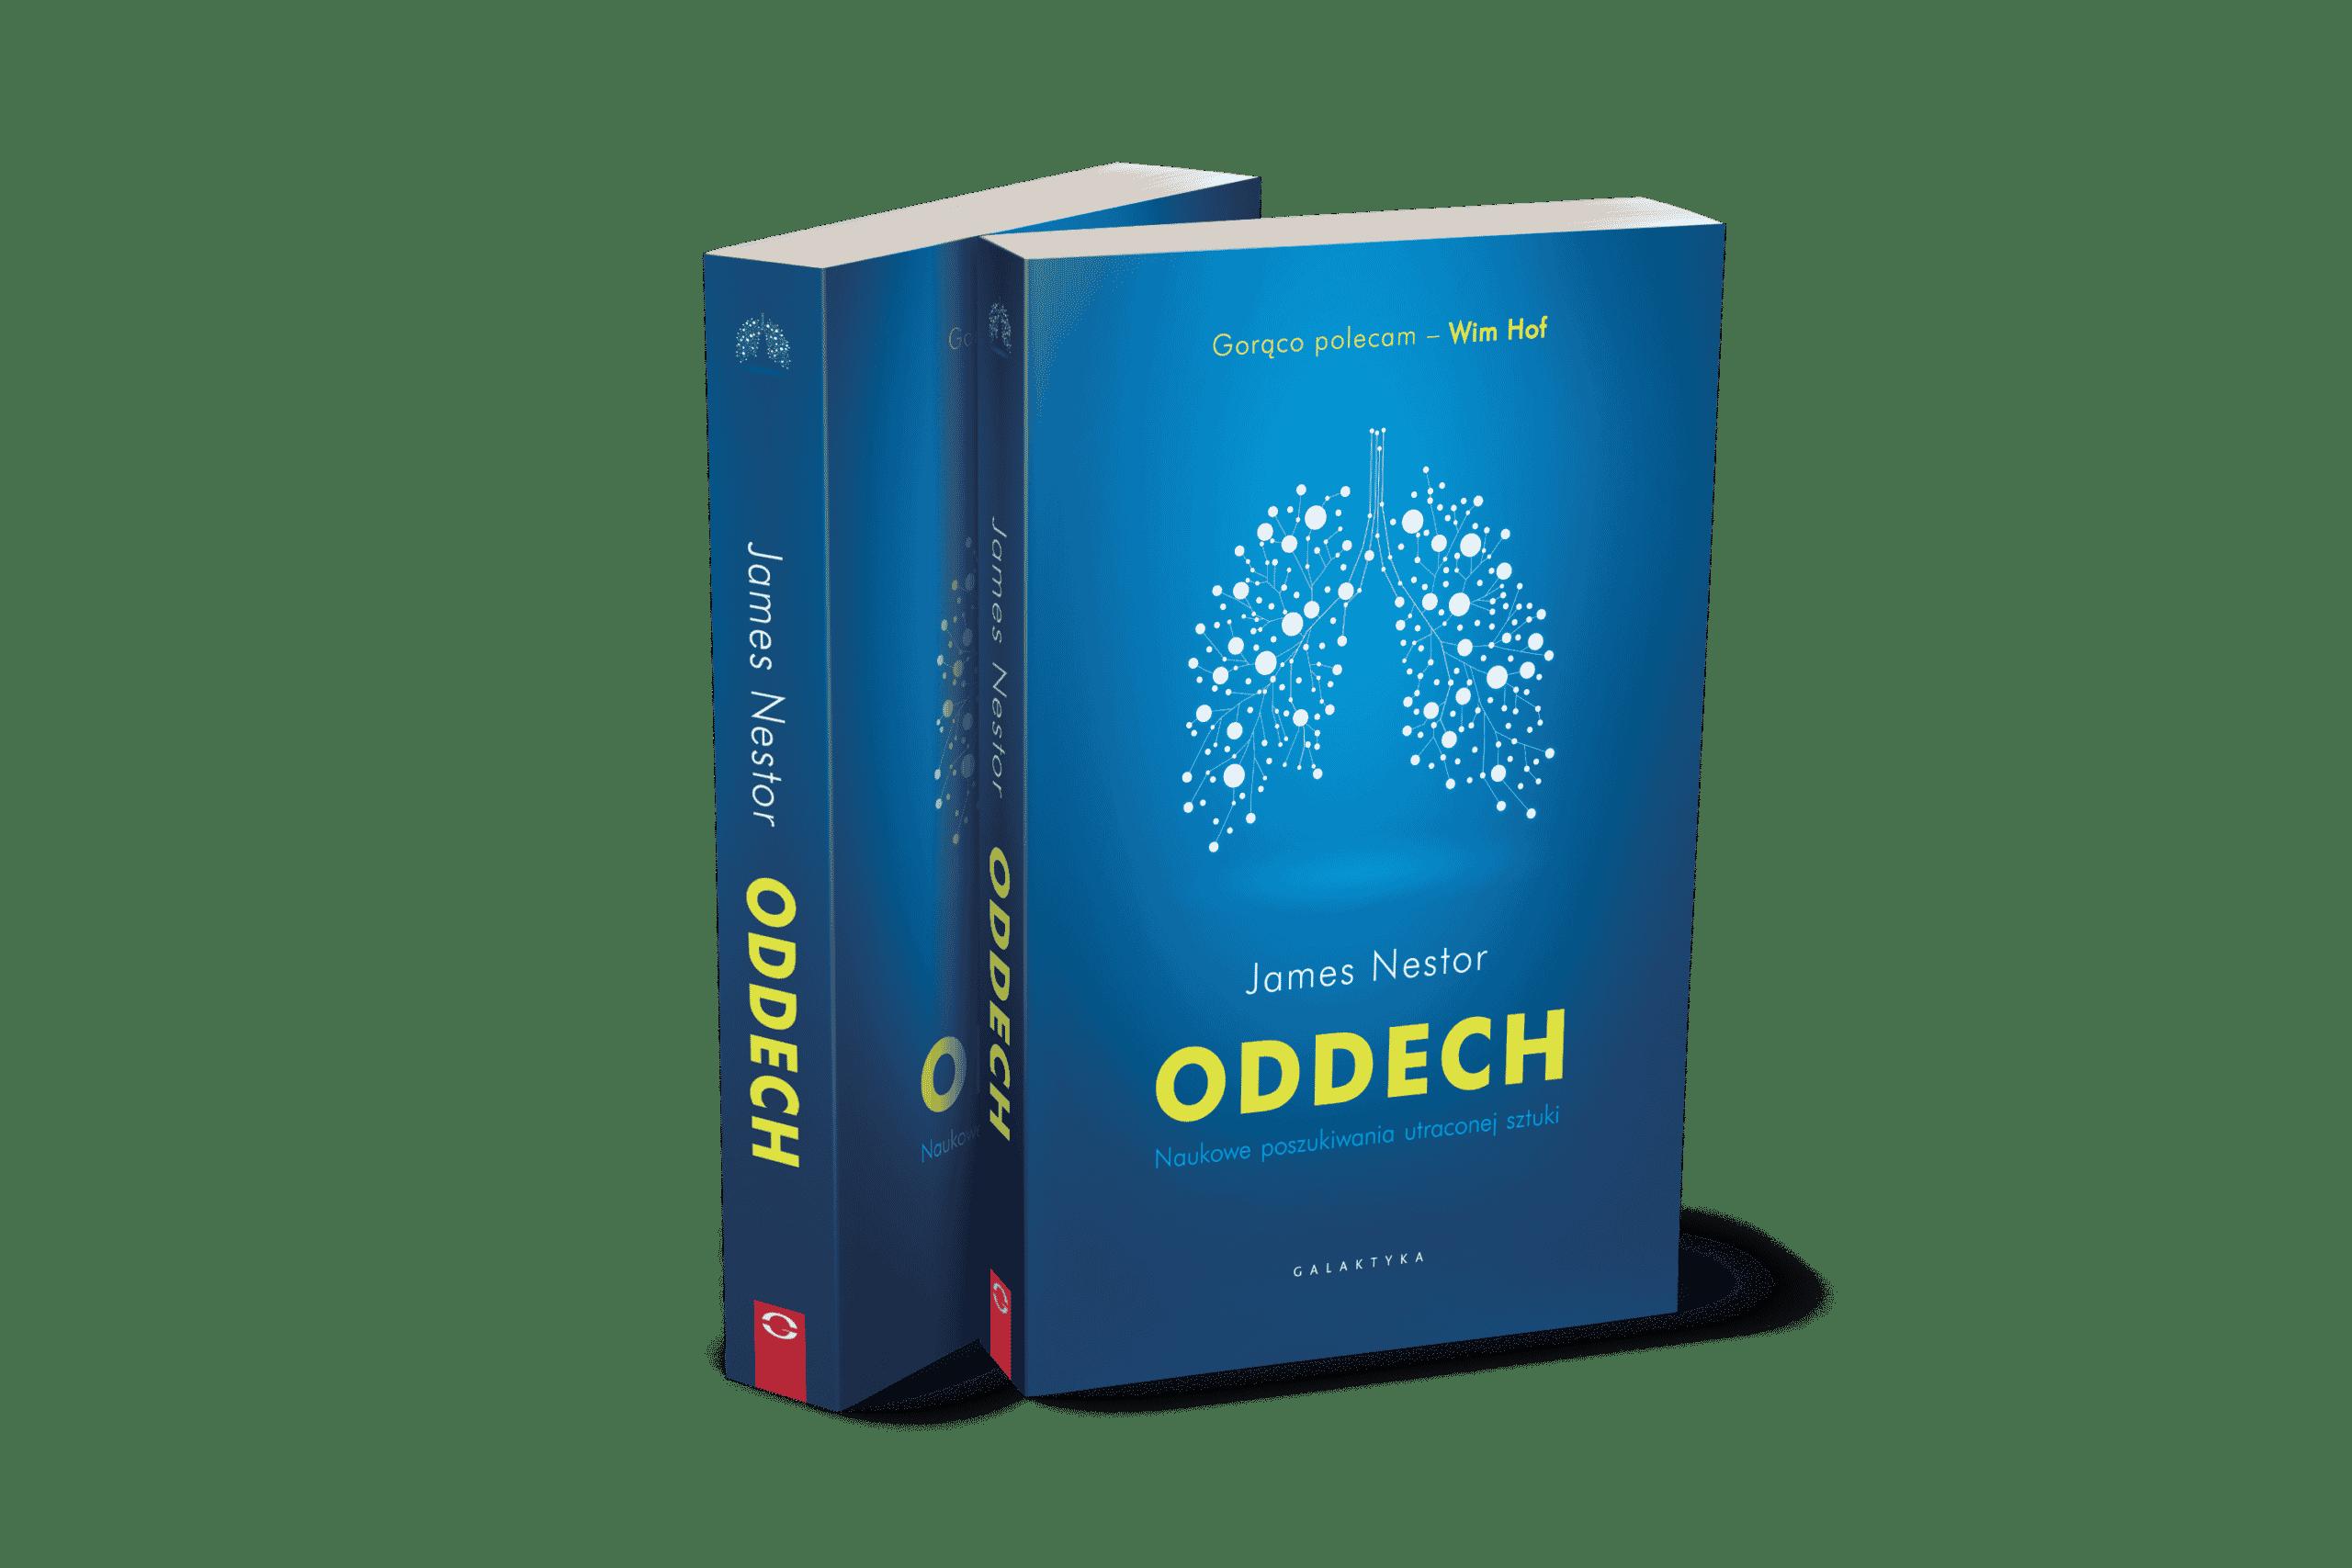 oddech_mockup